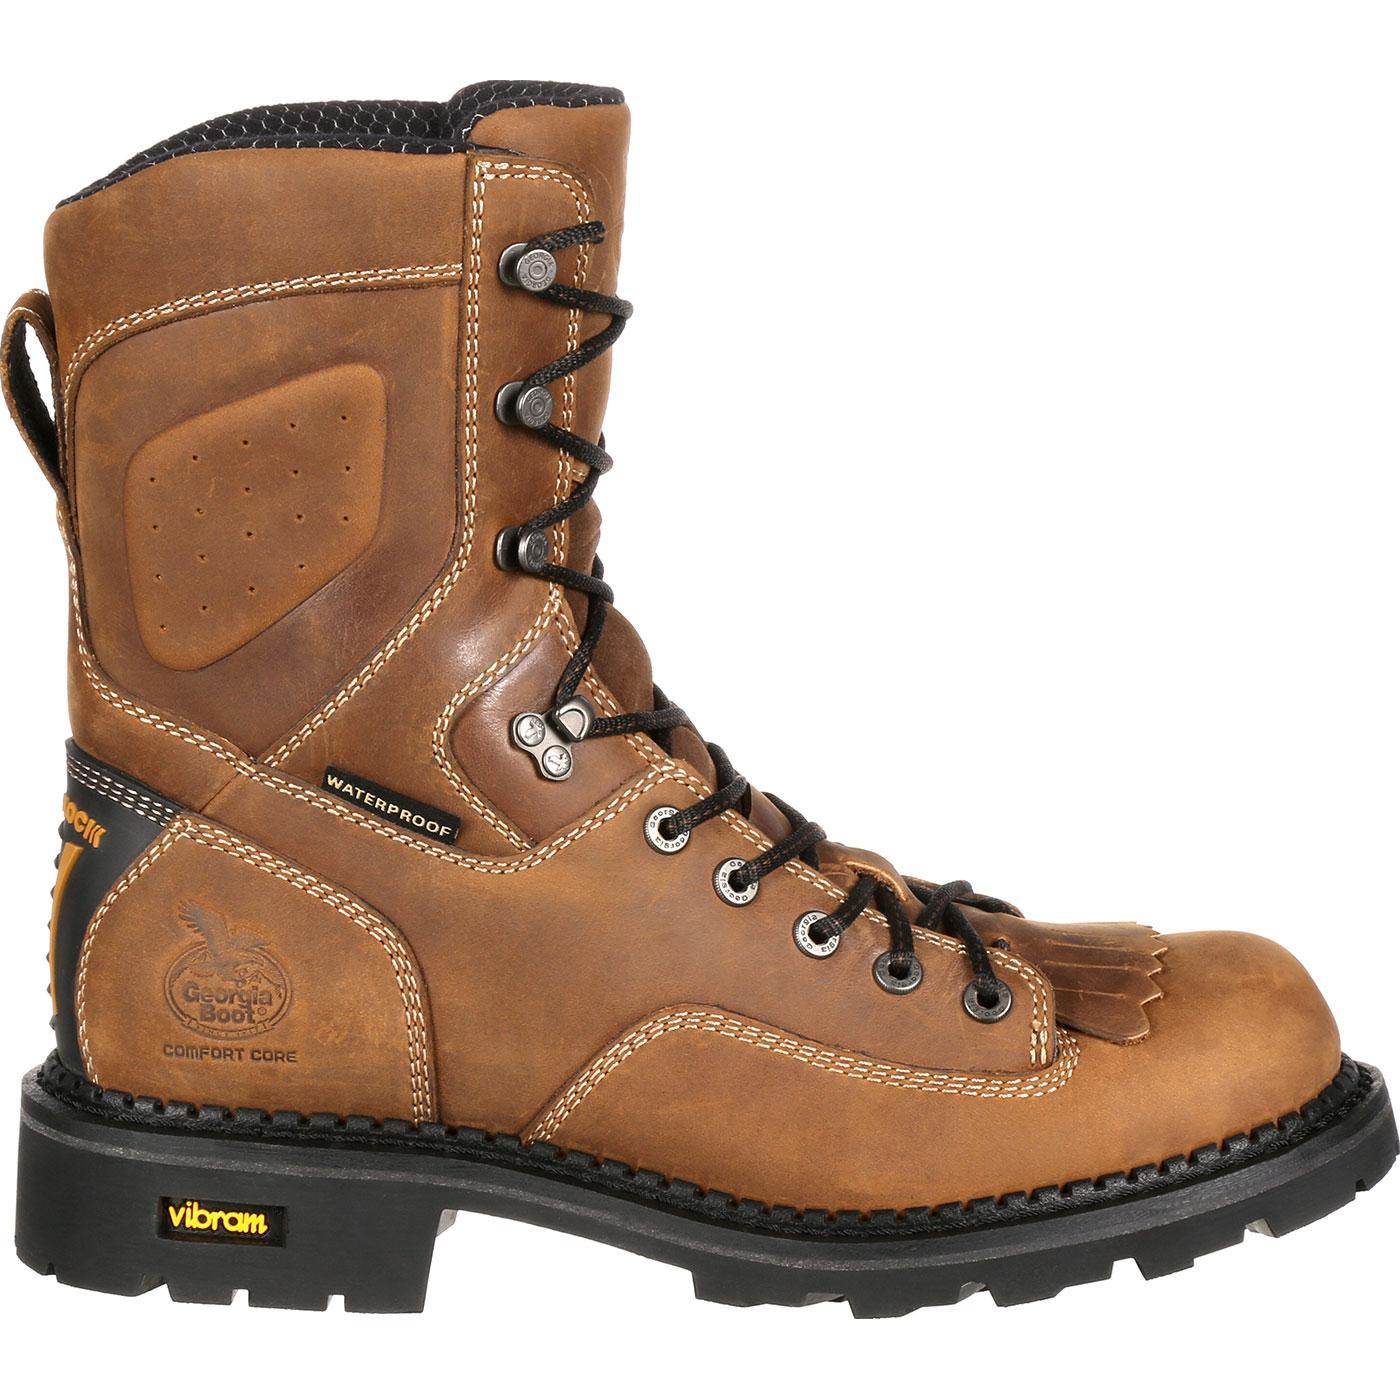 Composite Toe Waterproof Logger, Georgia Boot Comfort Core